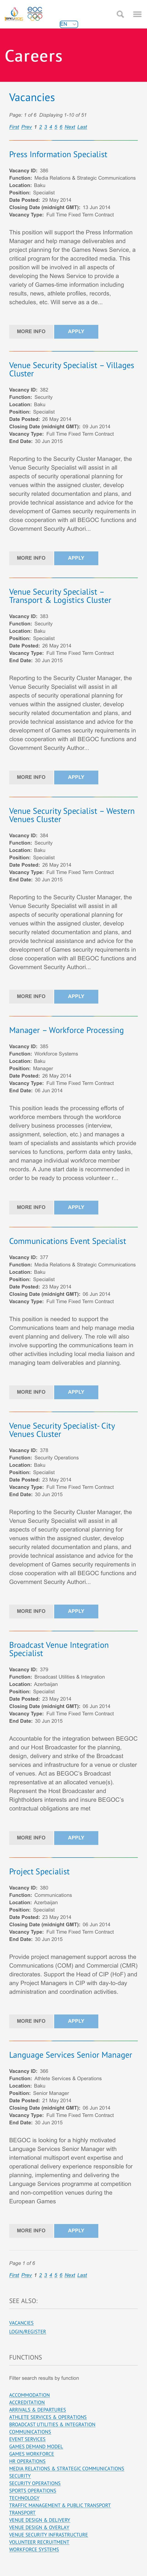 Baku 2015 mobile responsive careers site